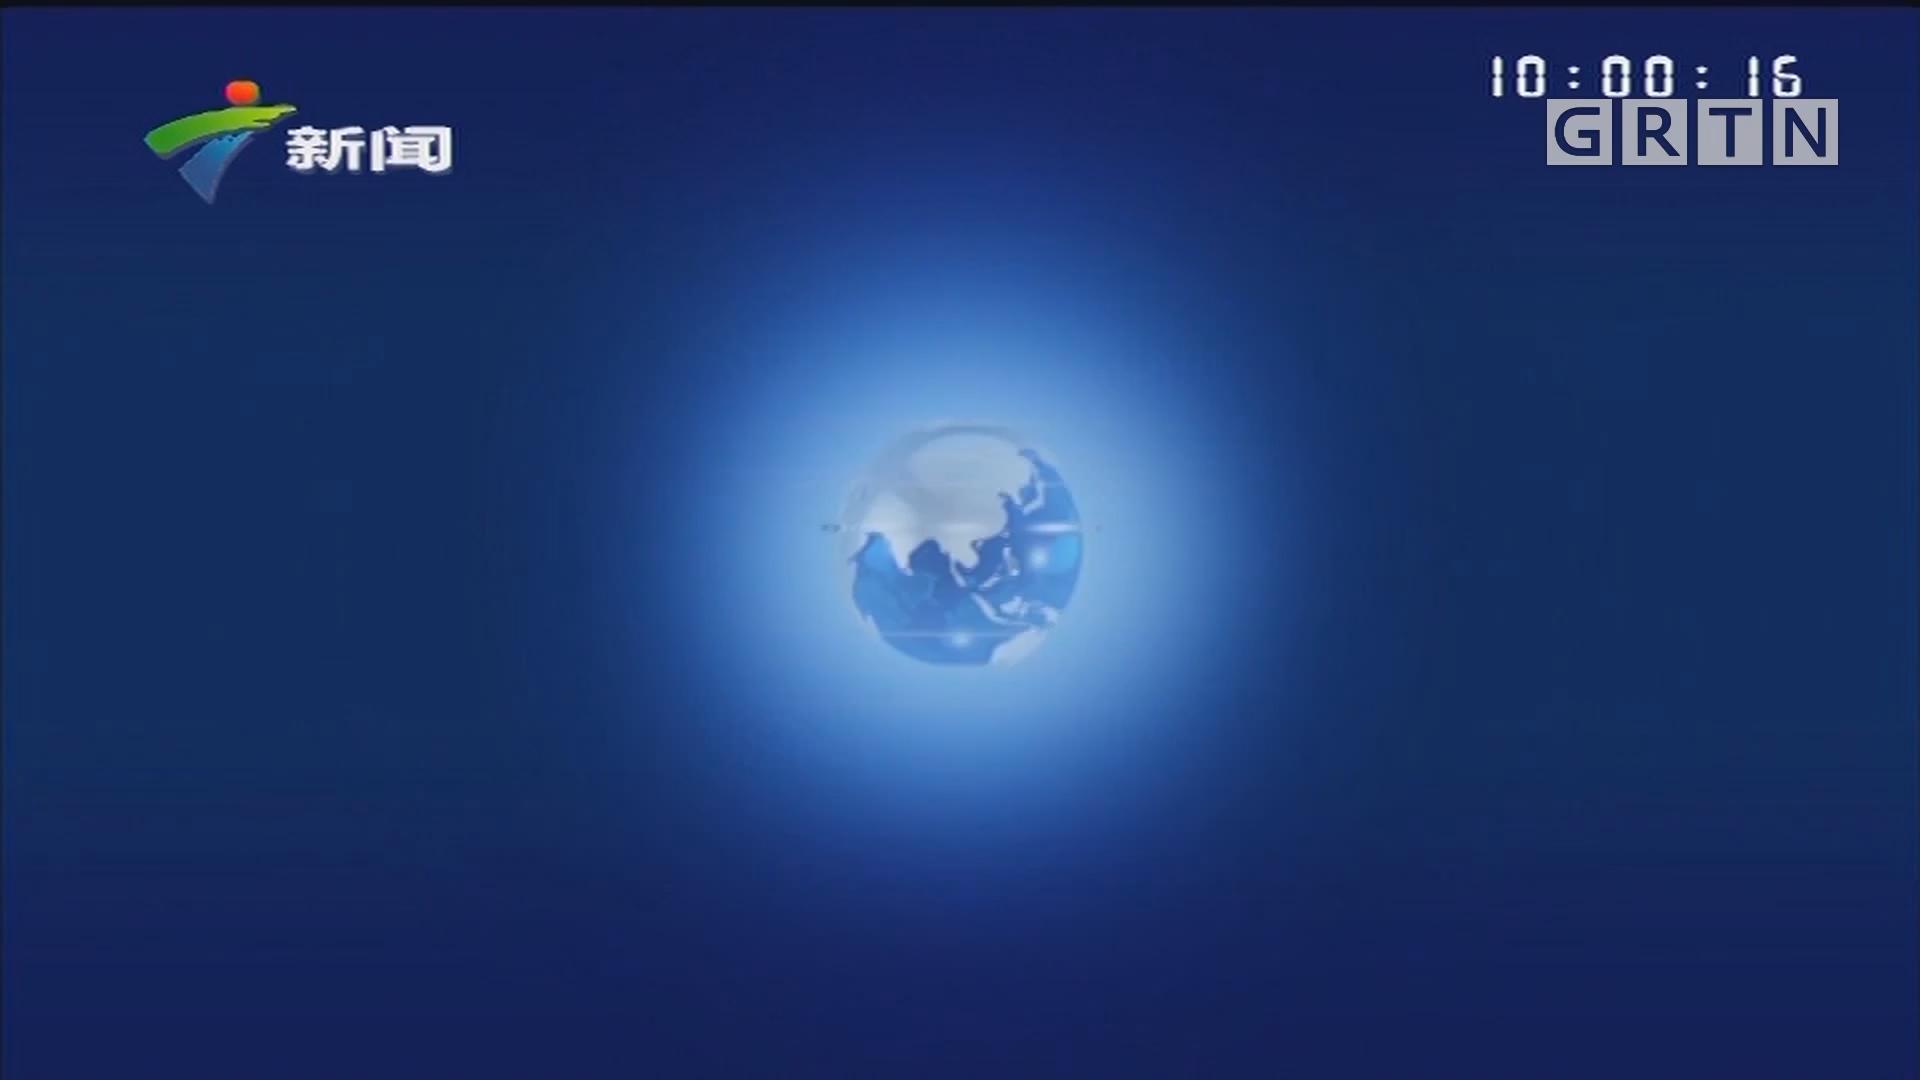 [HD][2019-10-21]正點播報:聚焦第六屆世界互聯網大會 記者體驗:互聯網科技創造新生活